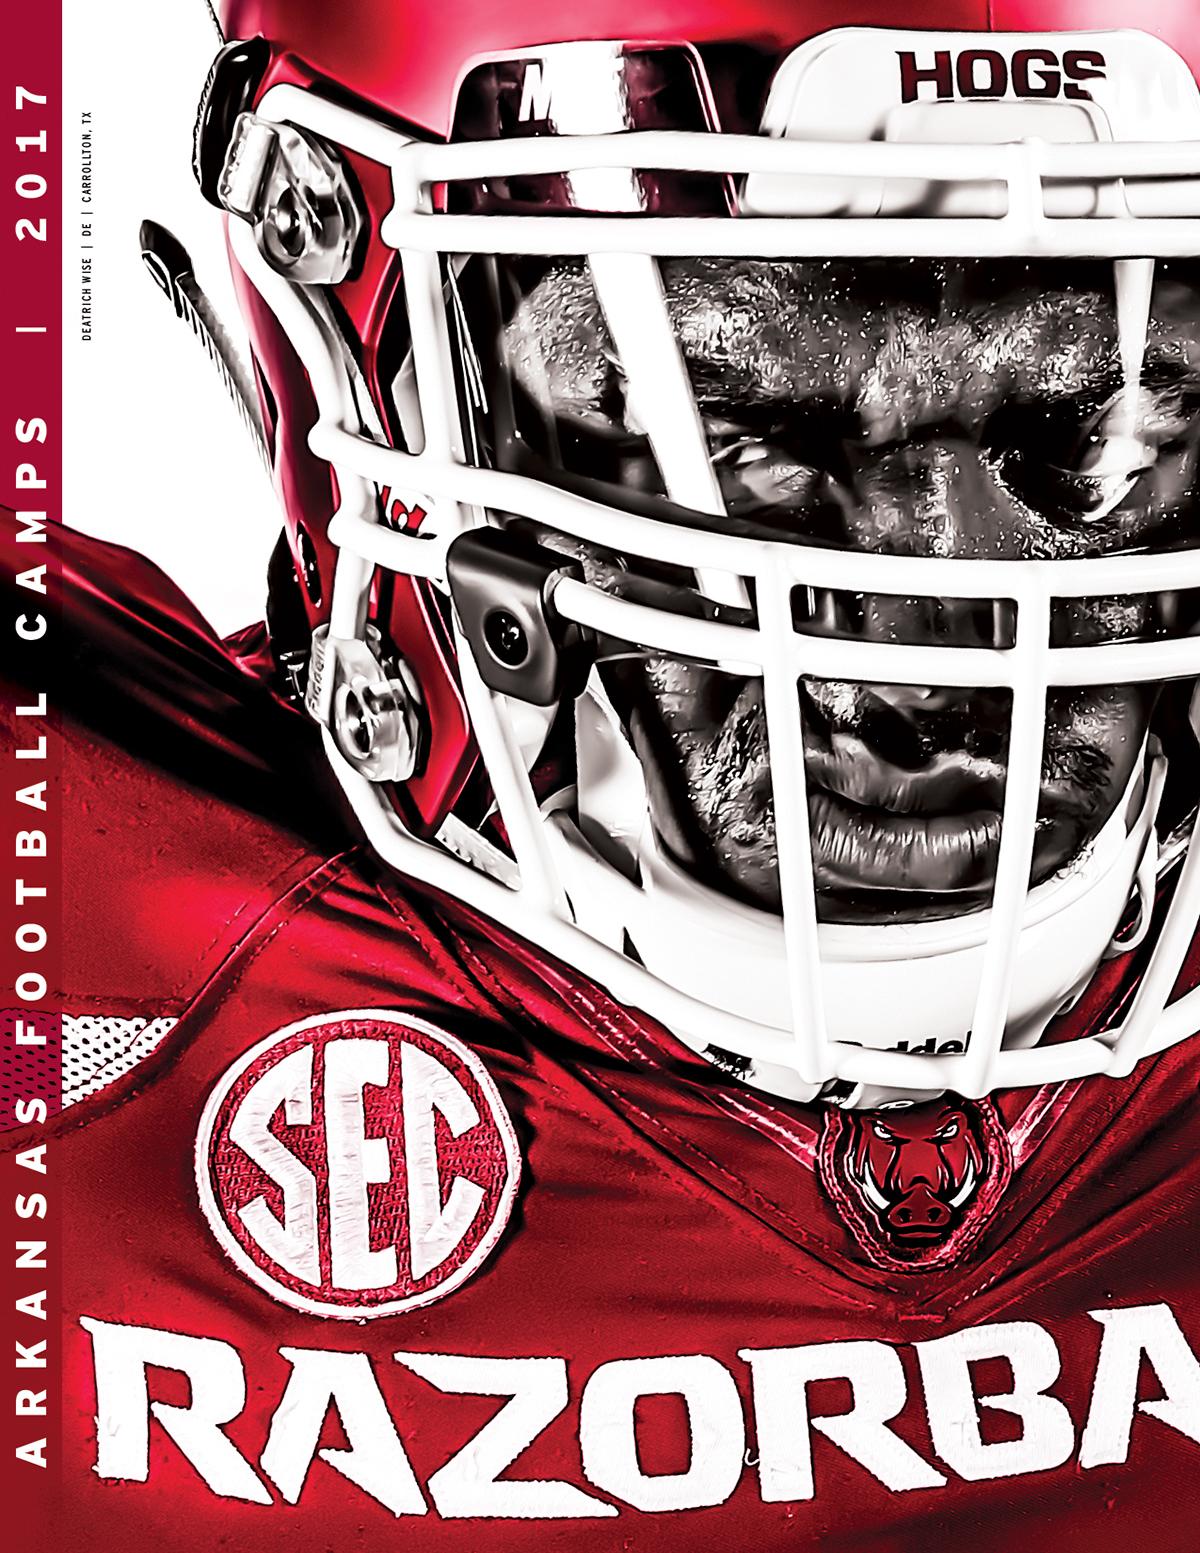 Arkansas Razorbacks 2017 Football Camps Brochure On Behance